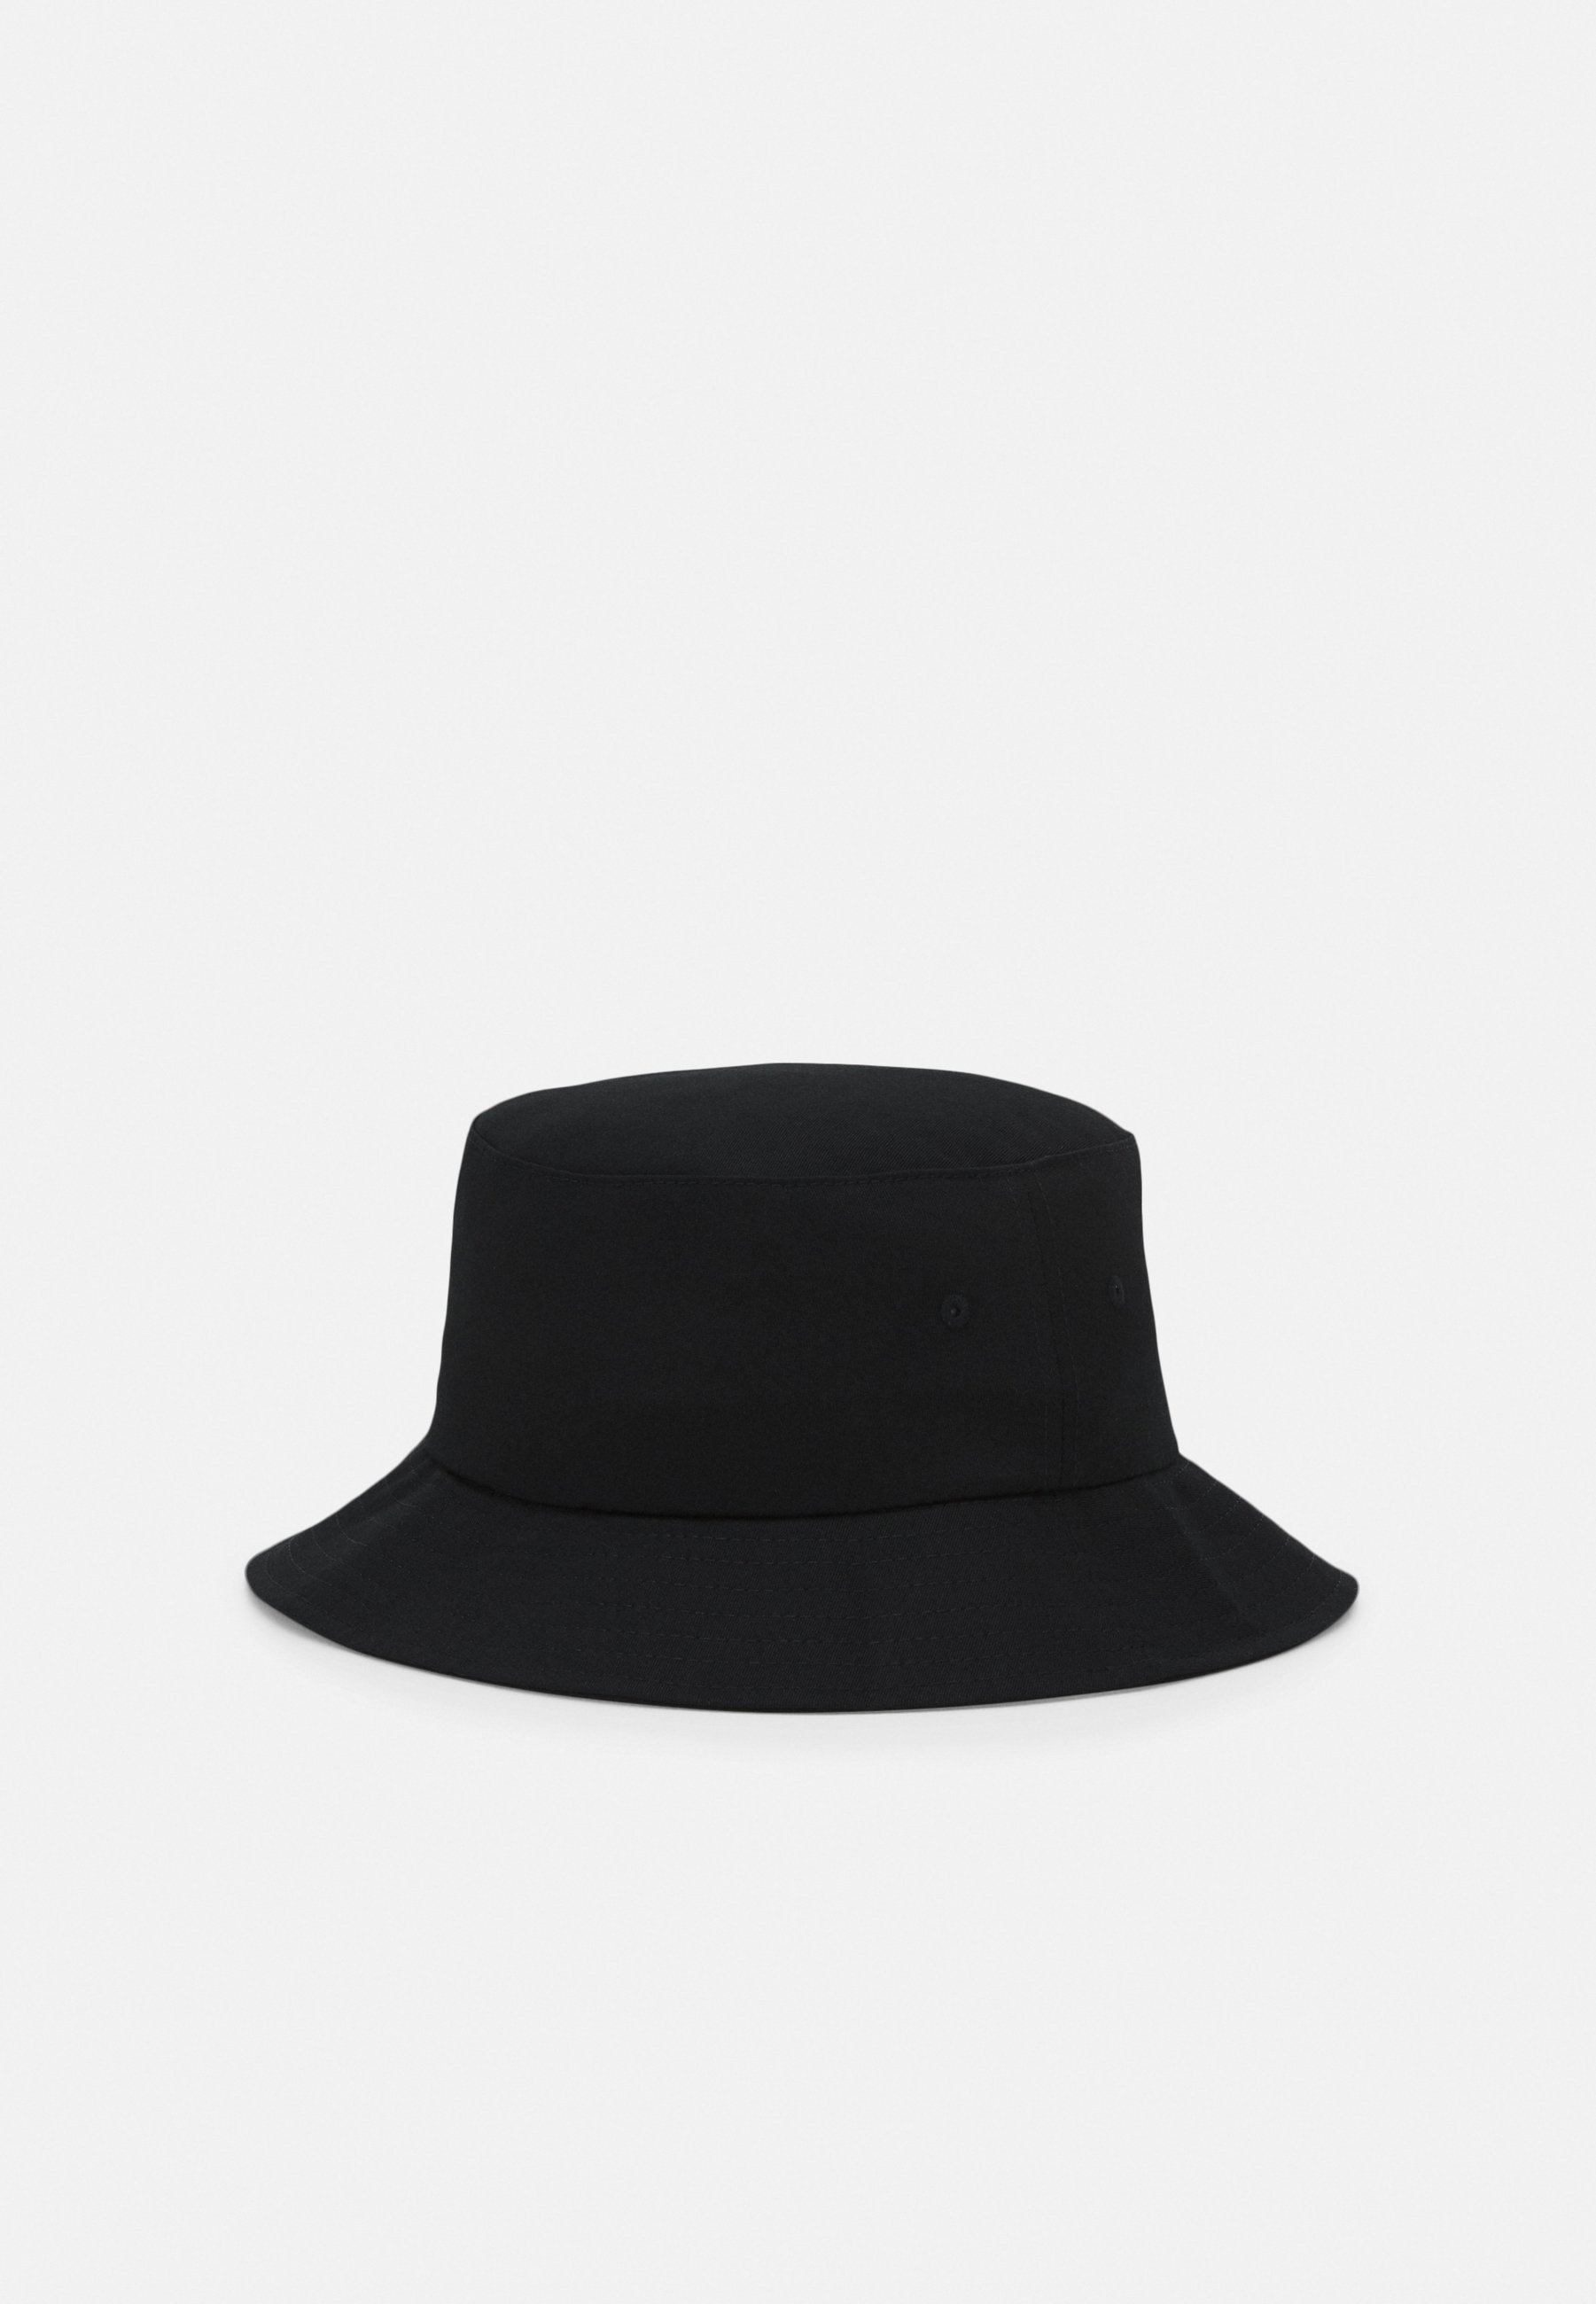 Homme PRAY BUCKET HAT UNISEX - Chapeau